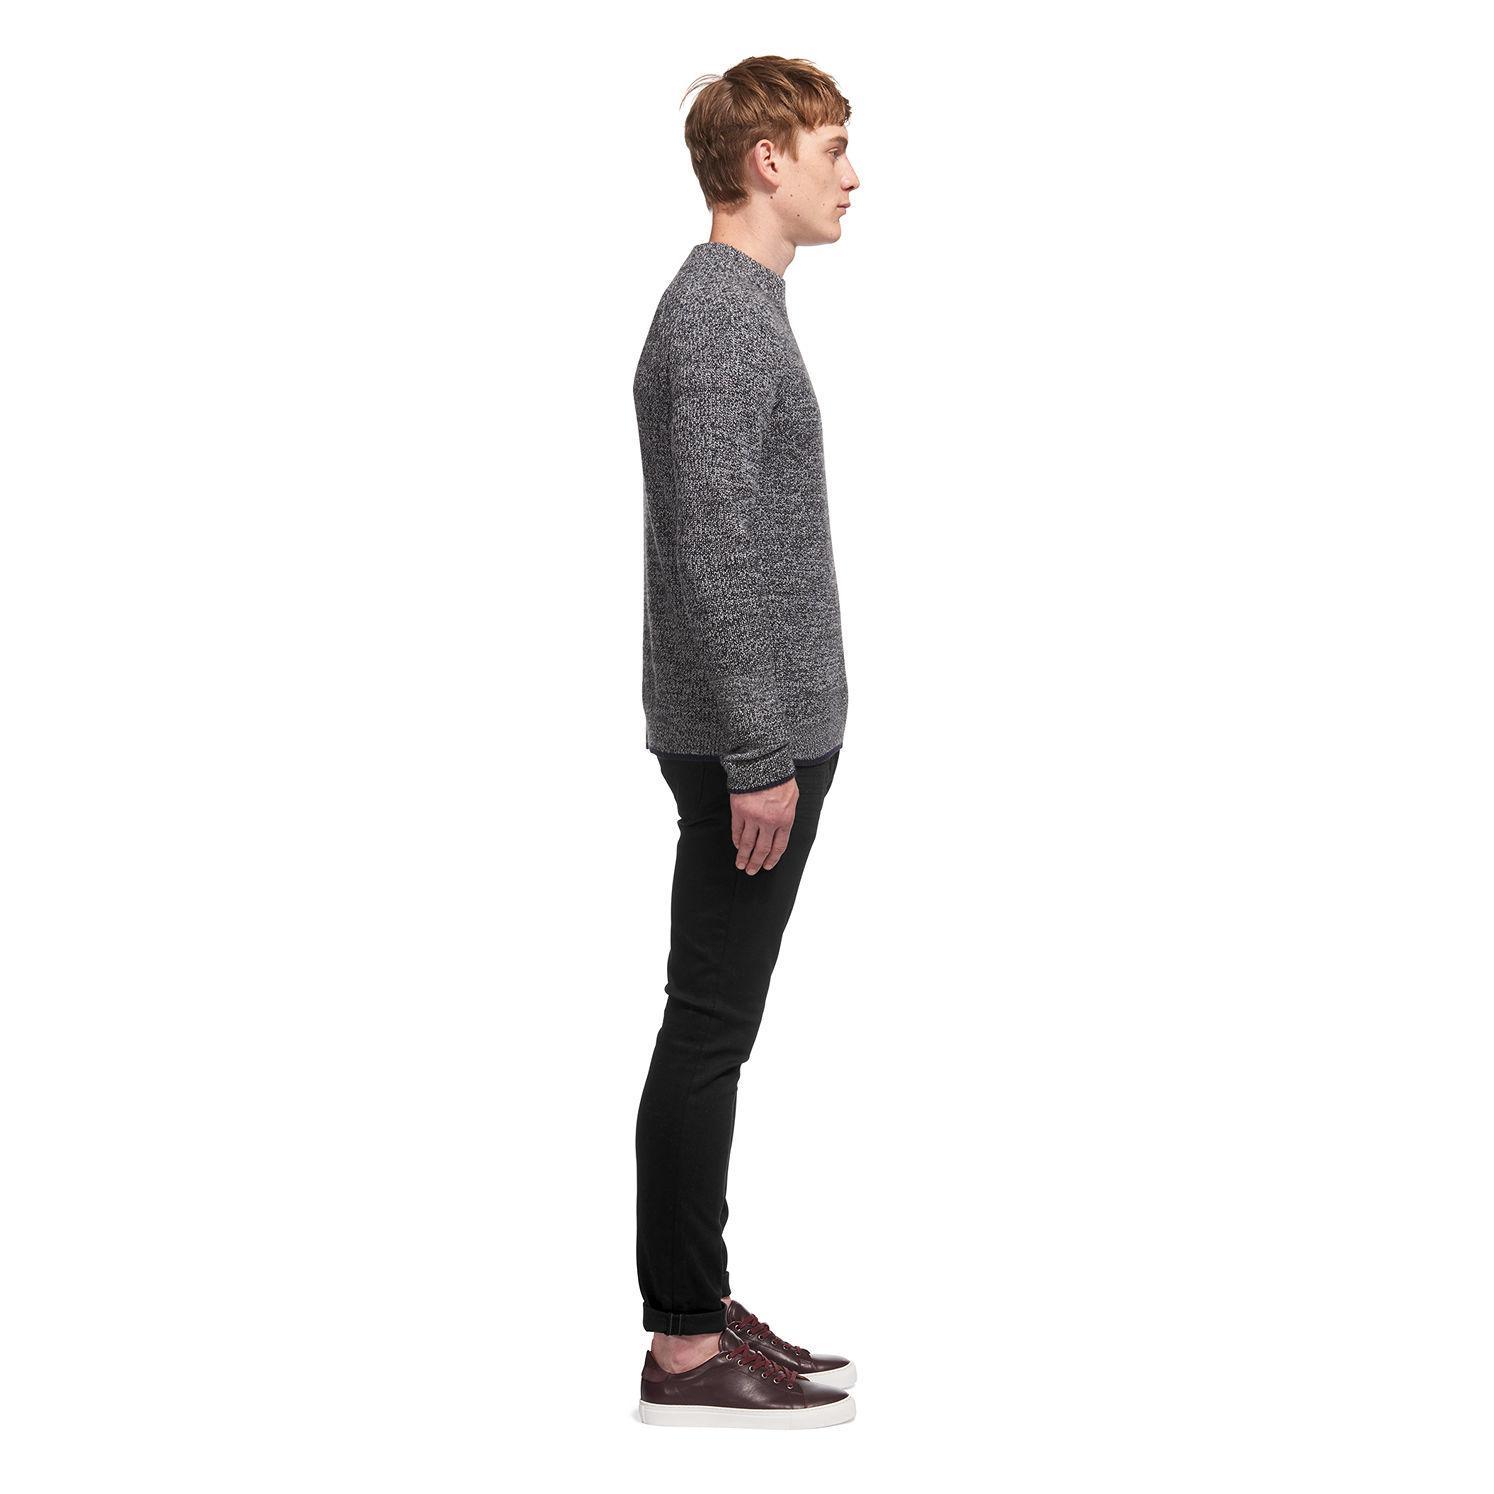 Whistles Denim Black/black Slim-fit Jeans for Men